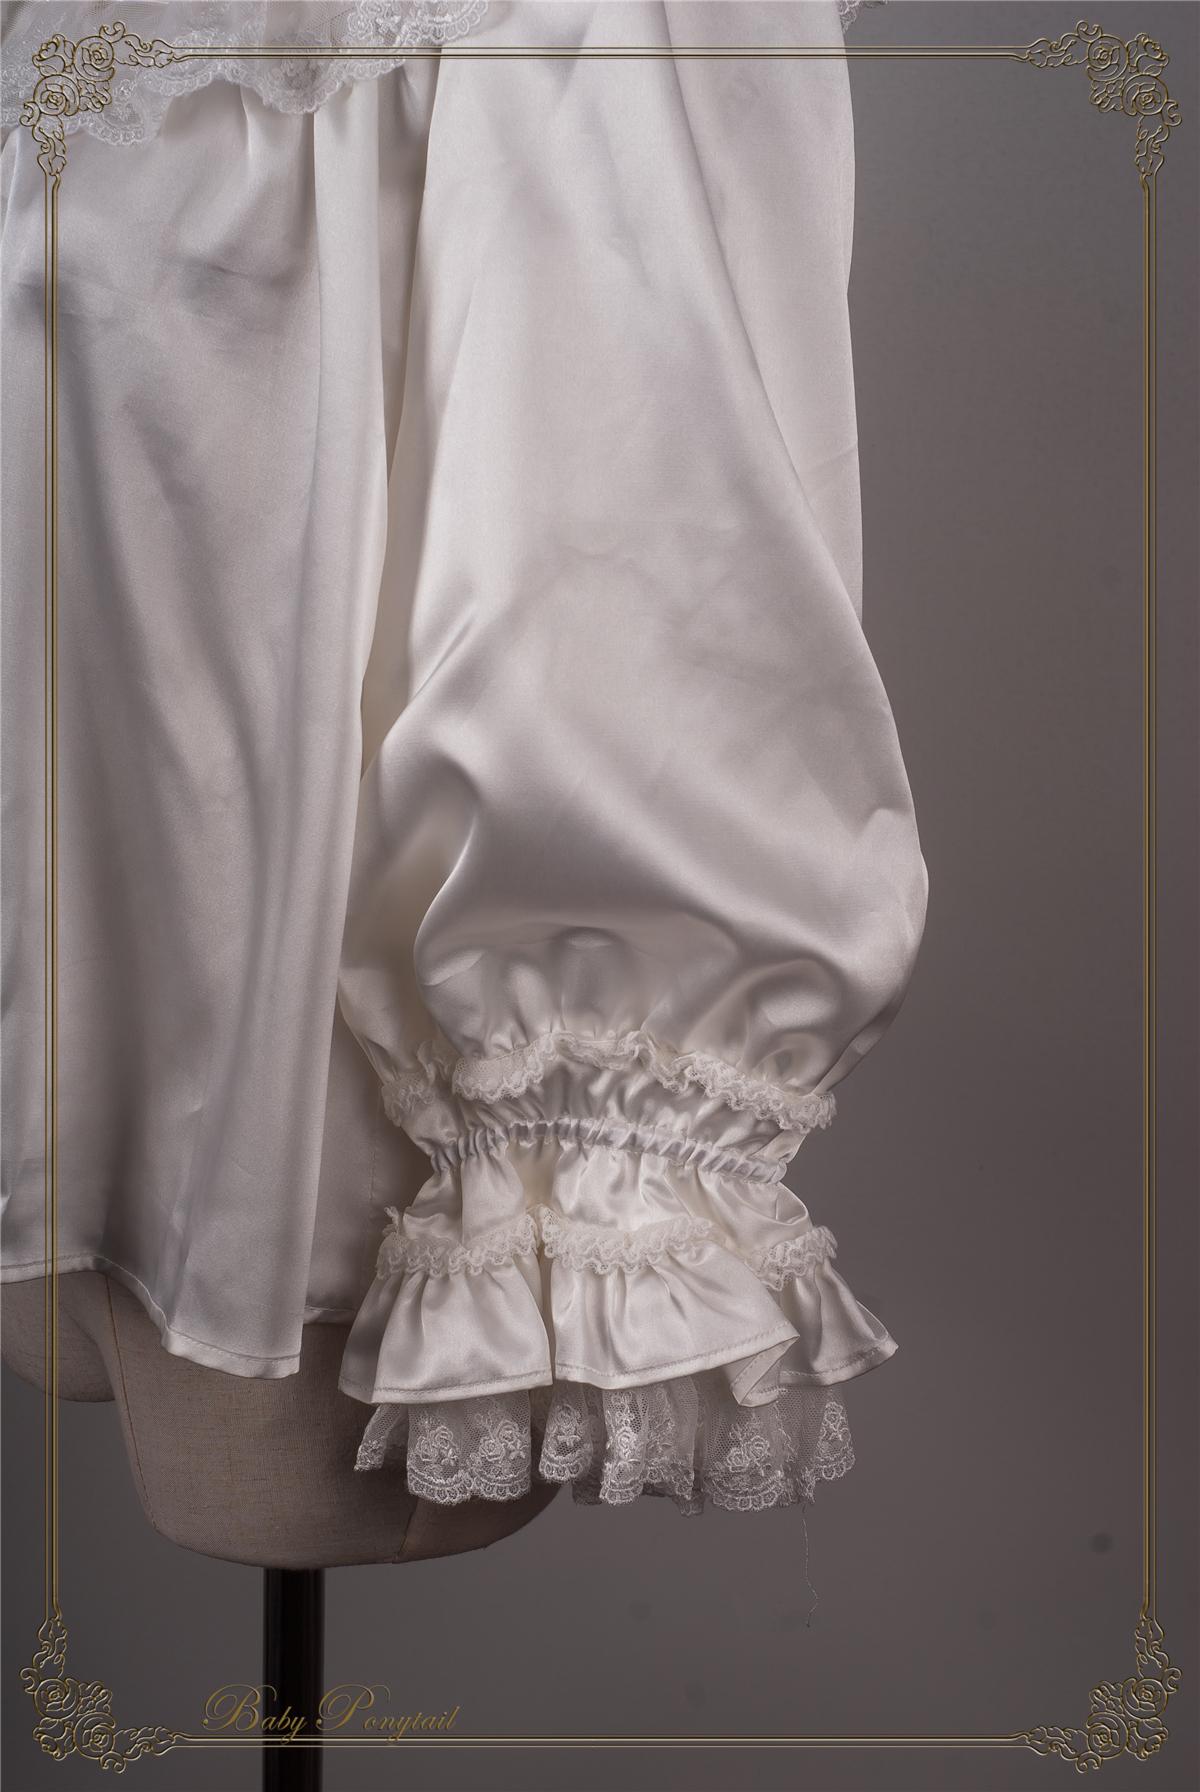 Babyponytail_Heavenly Teardrops_ Stock Photo_blouse_01.jpg